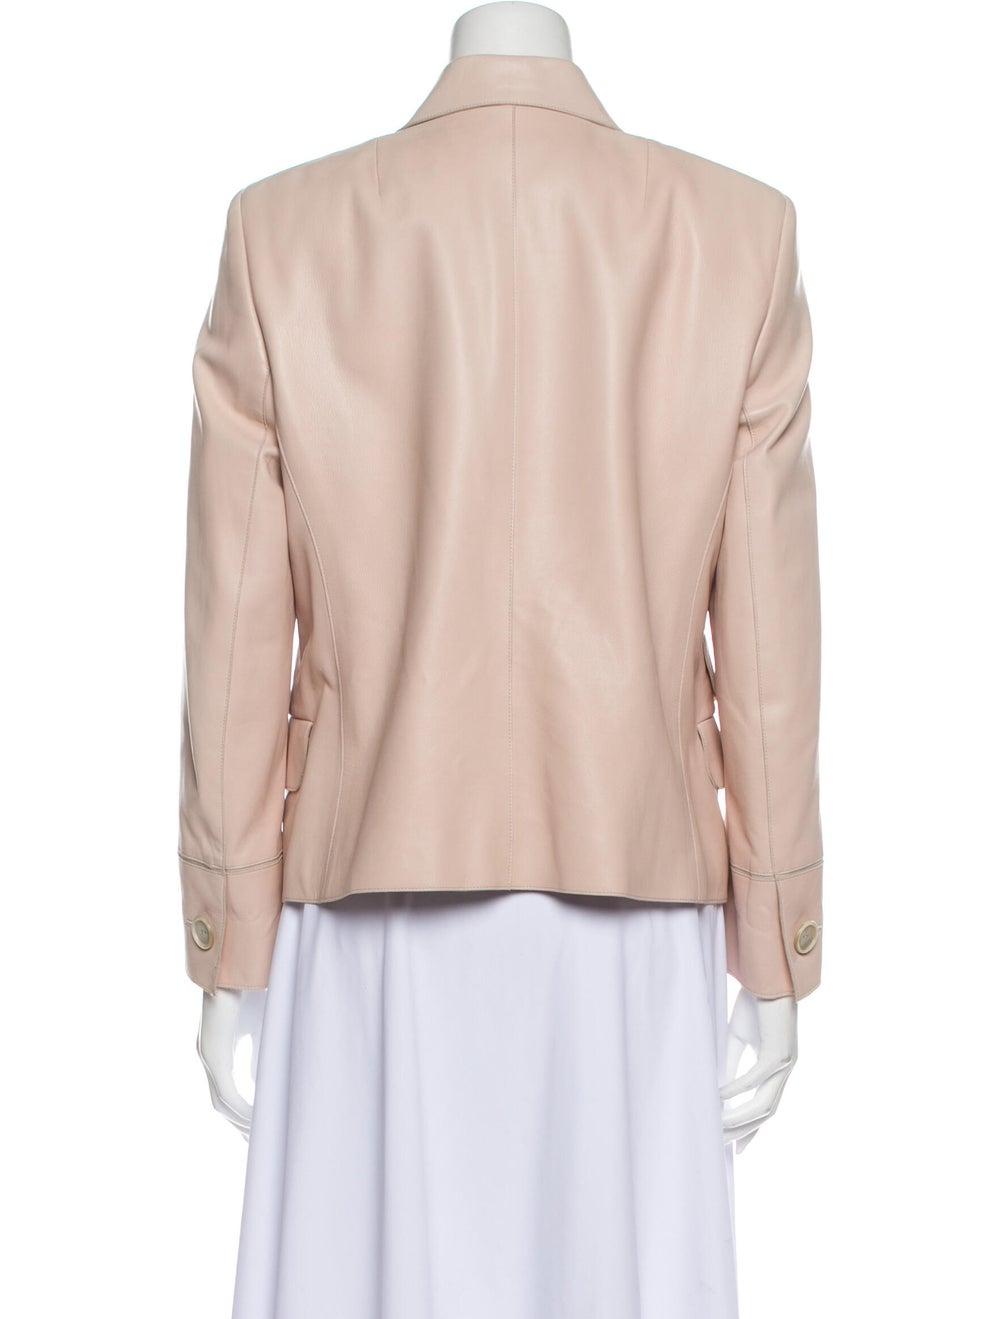 Akris Leather Blazer Pink - image 3